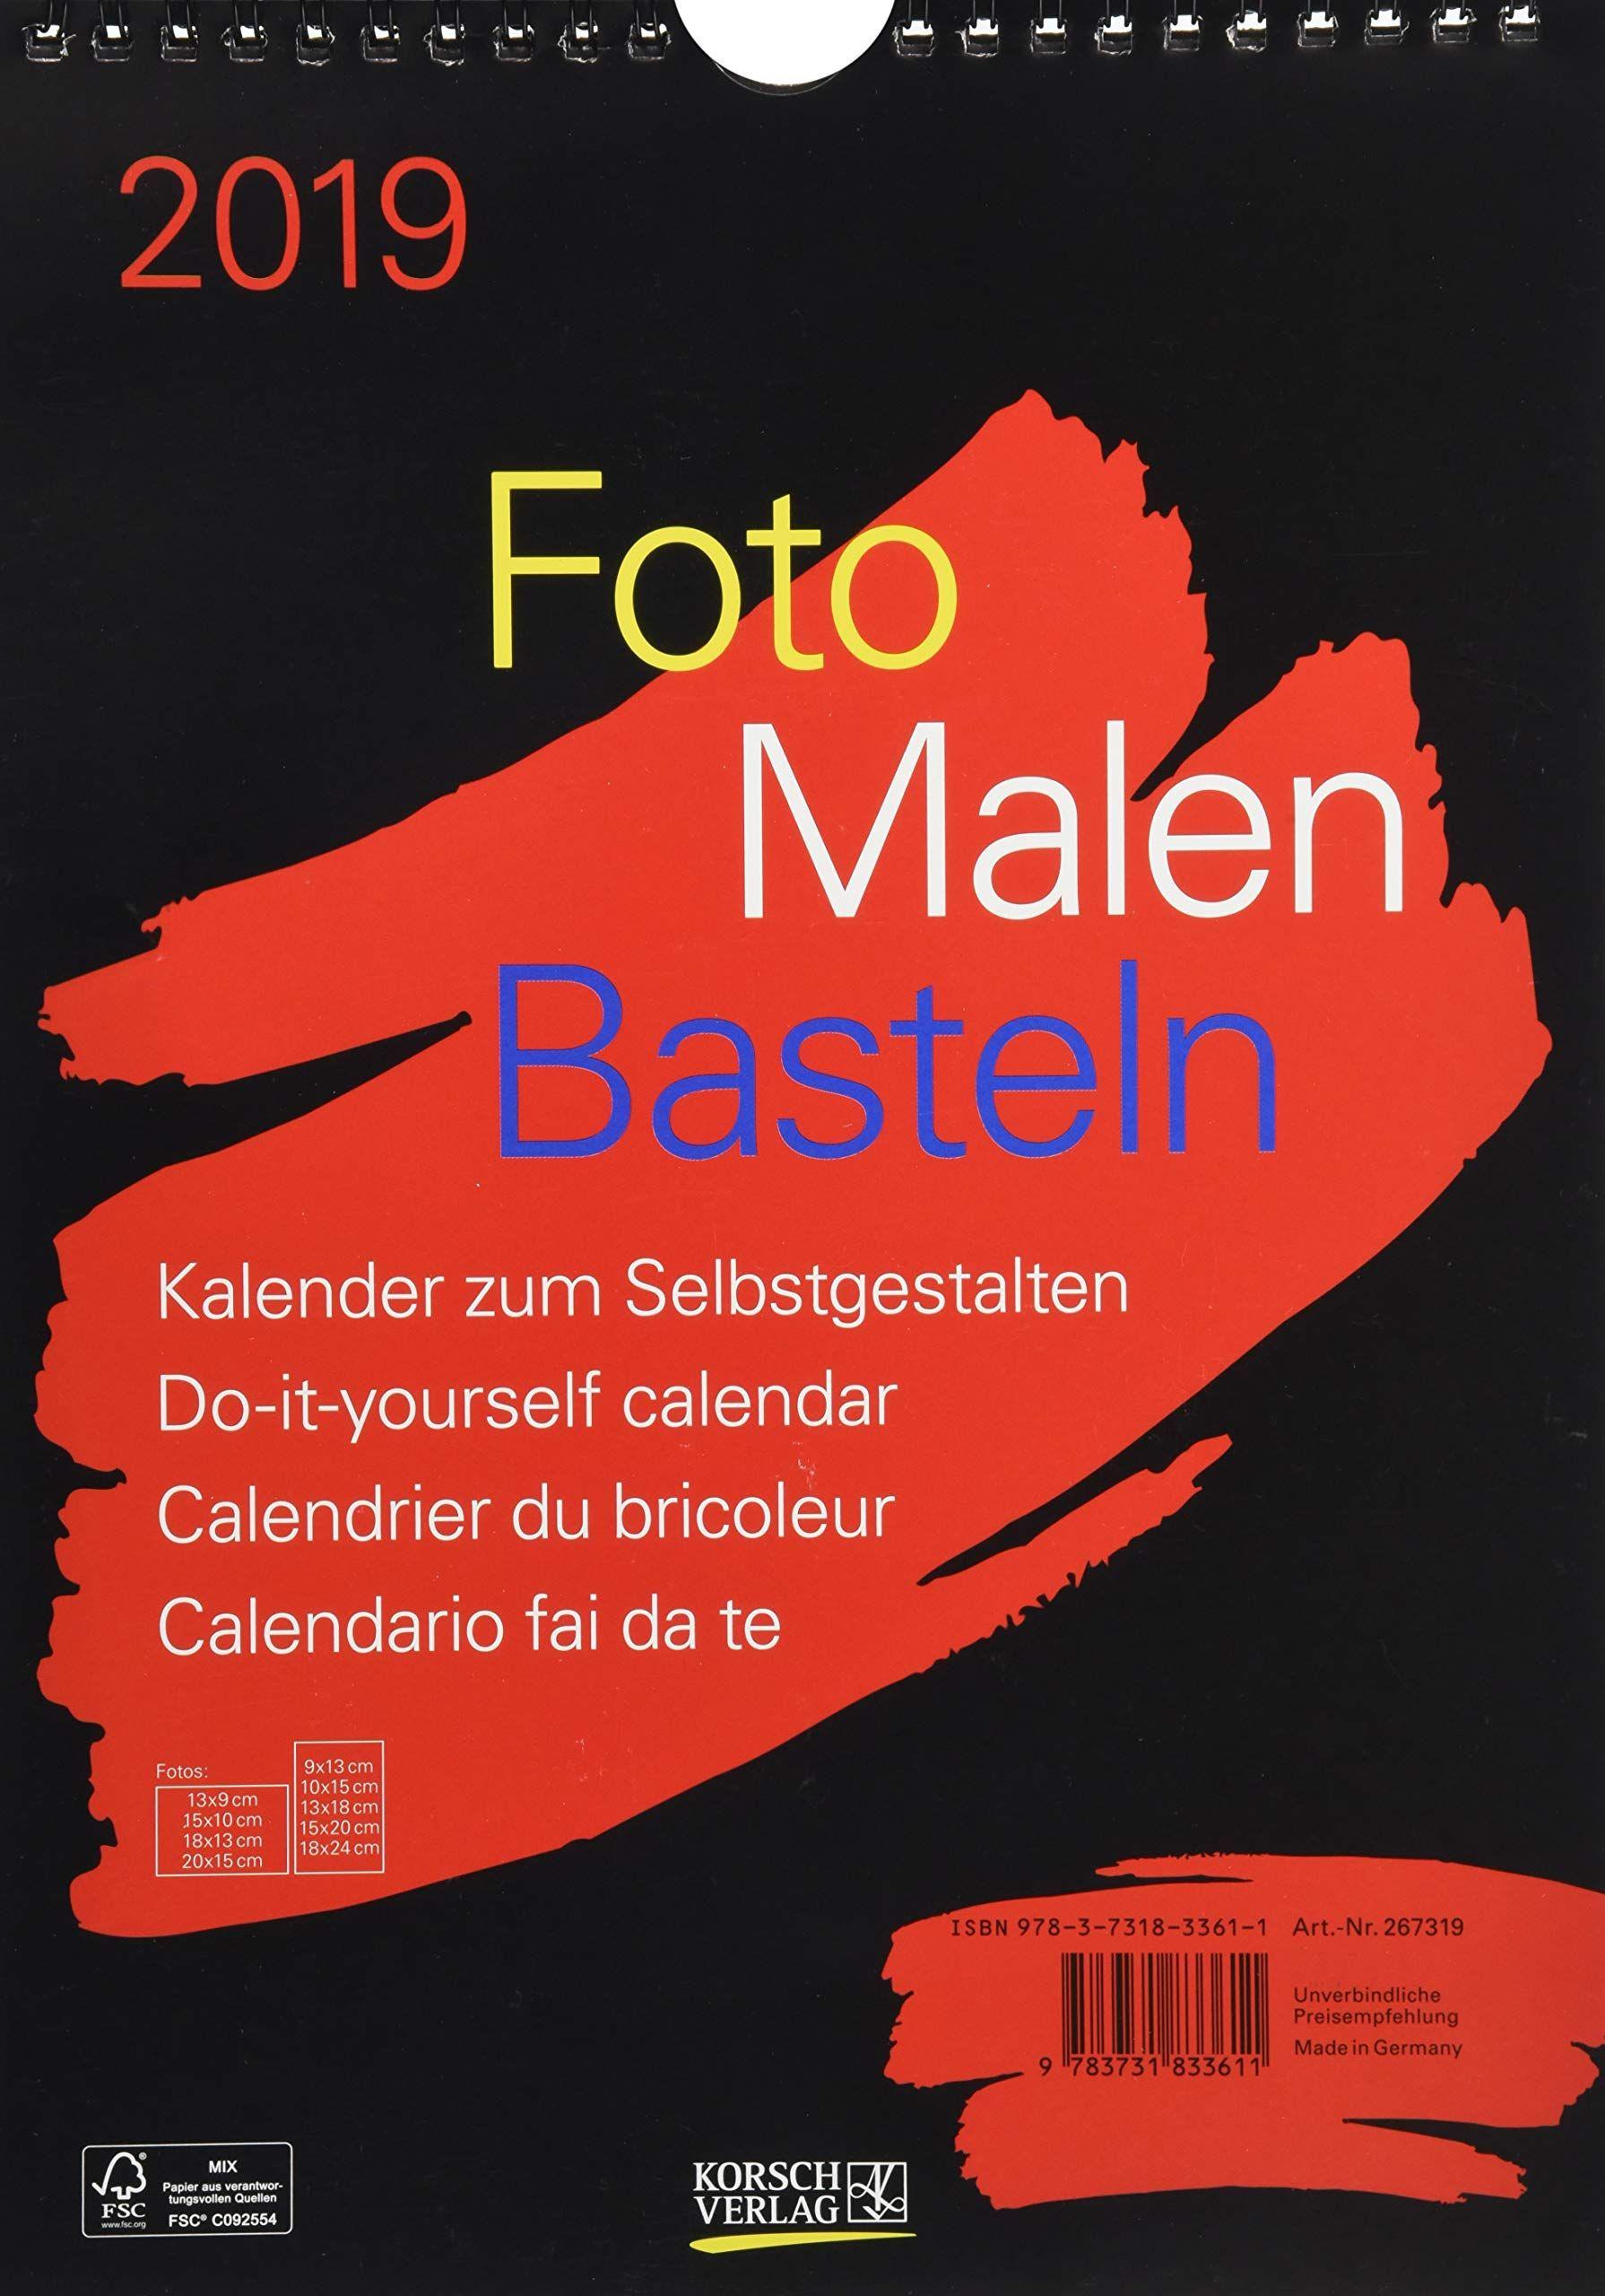 Foto Malen Basteln Schwarz 2019 Format A4 Kalender Zum Selbstgestalten Schwarz Basteln Foto Malen Calendario Fai Da Te Libri Libro Aperto